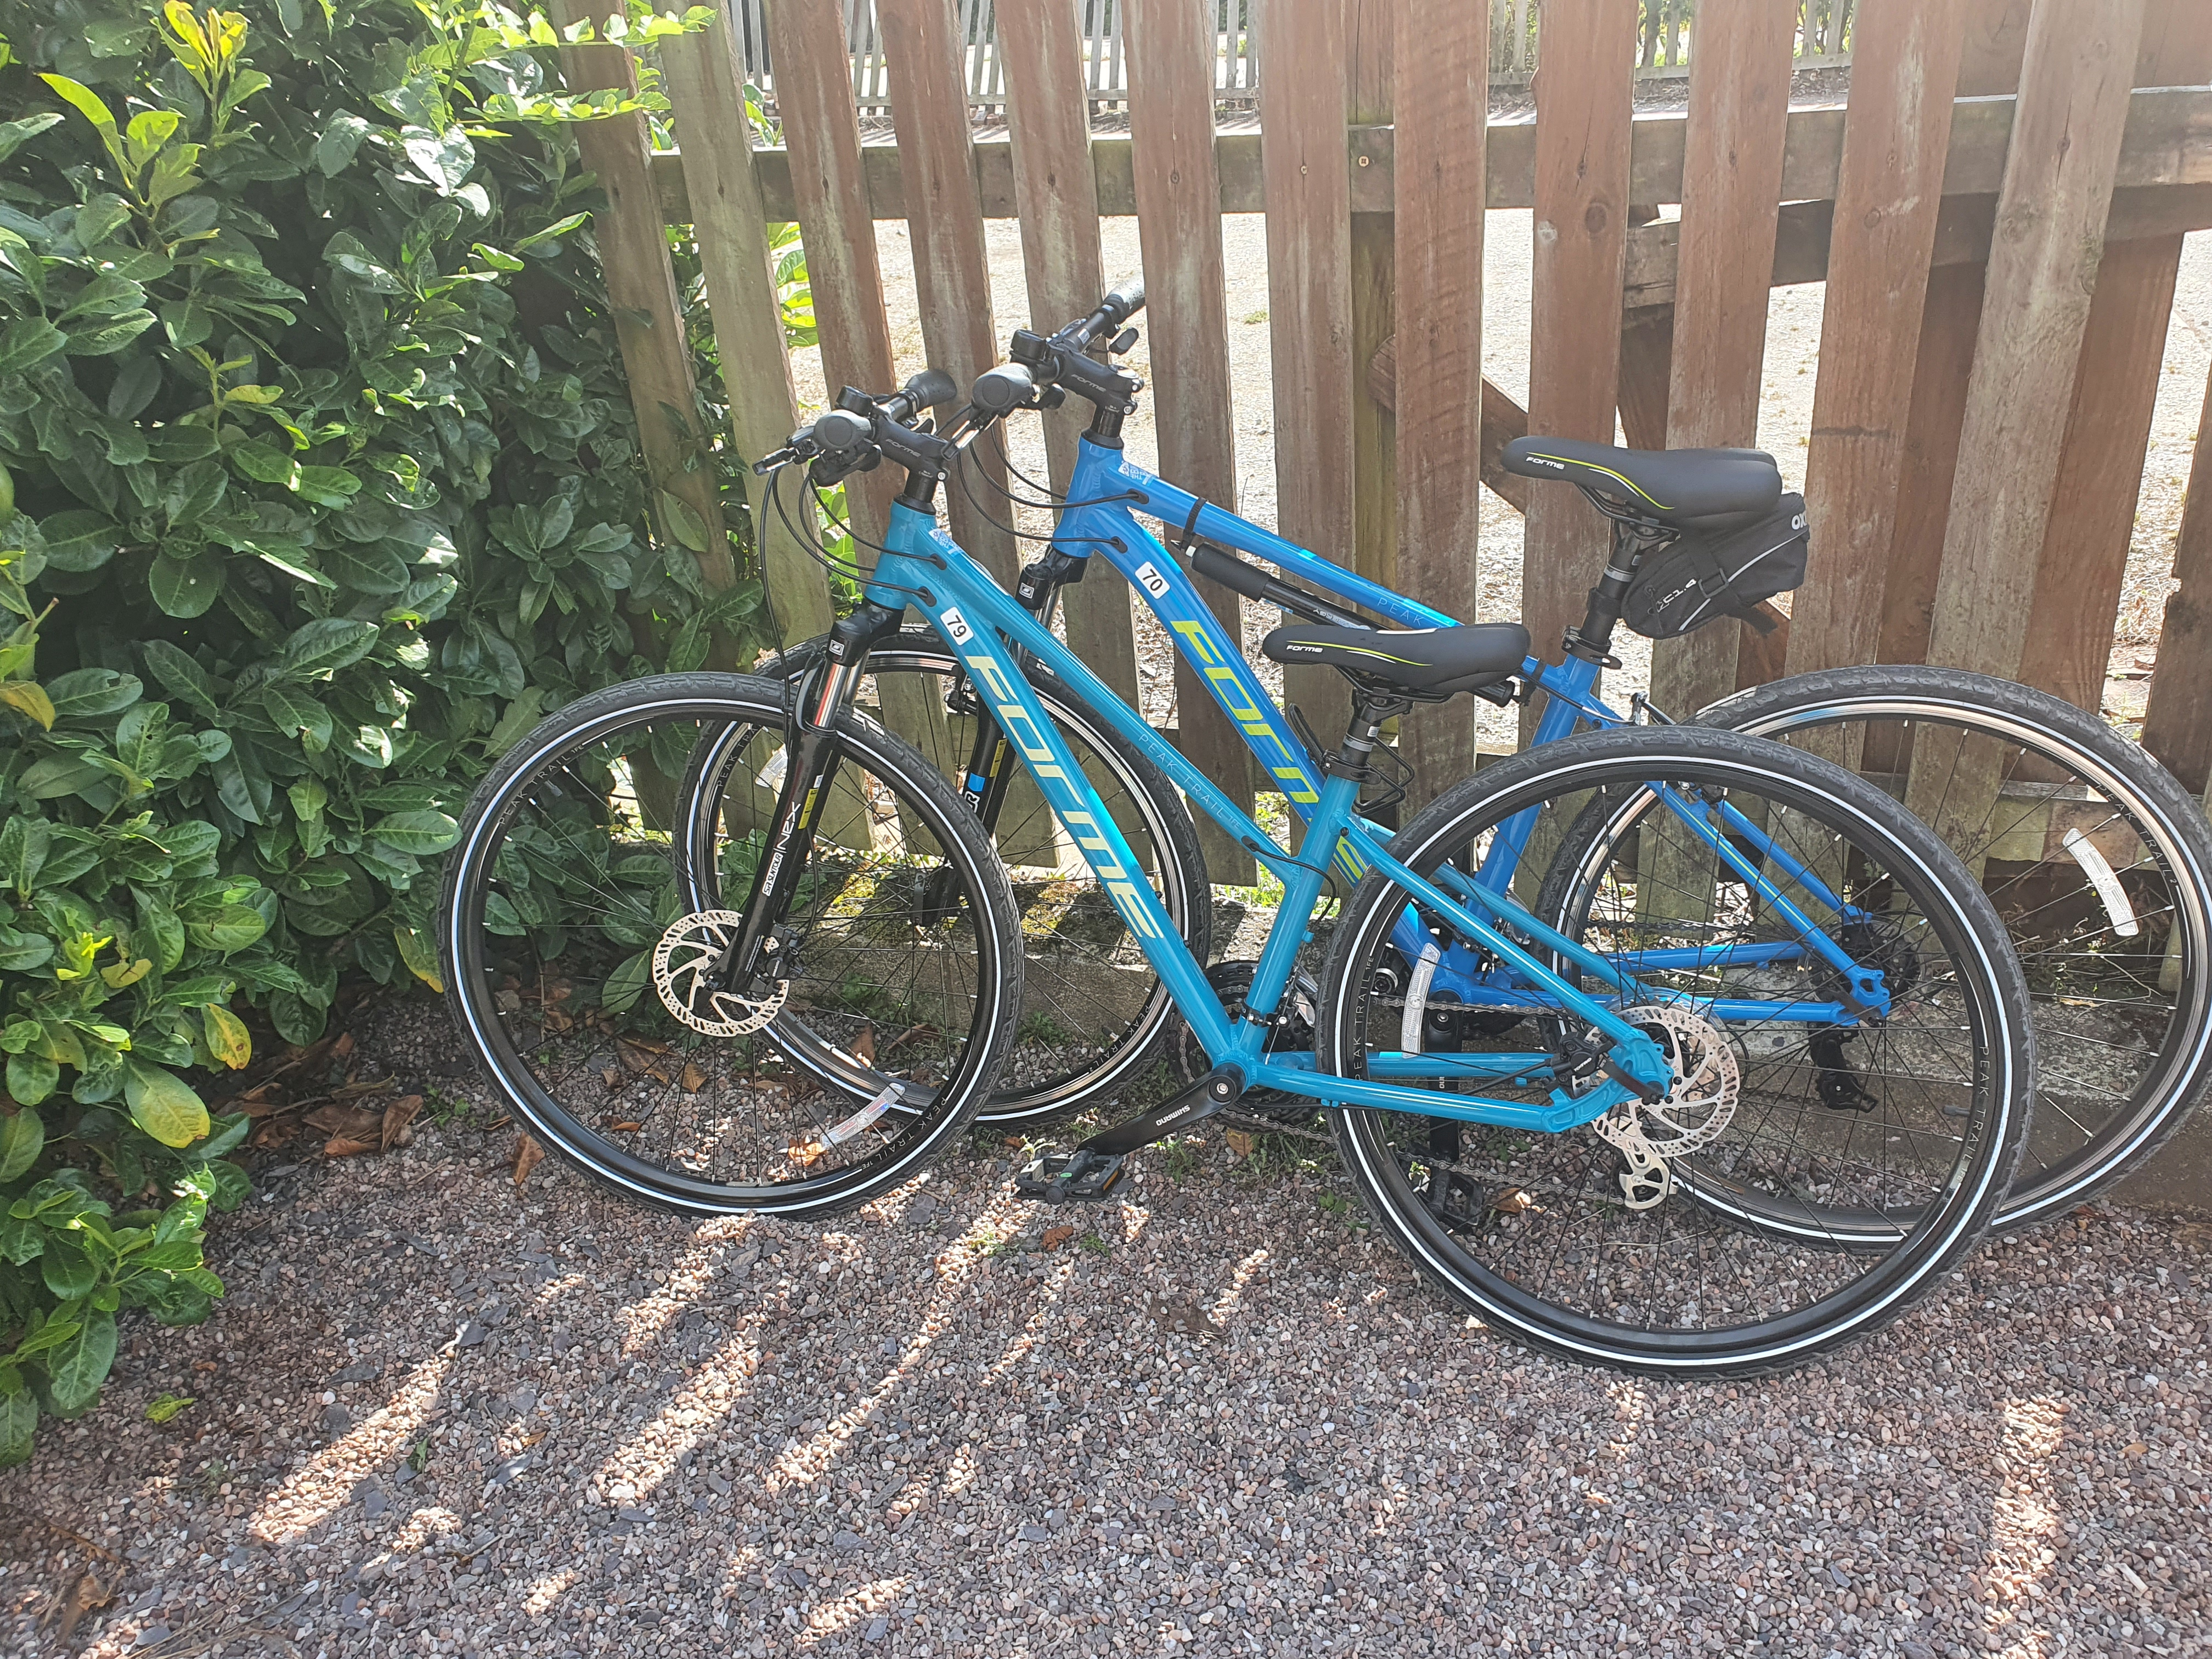 Brand new hire bikes